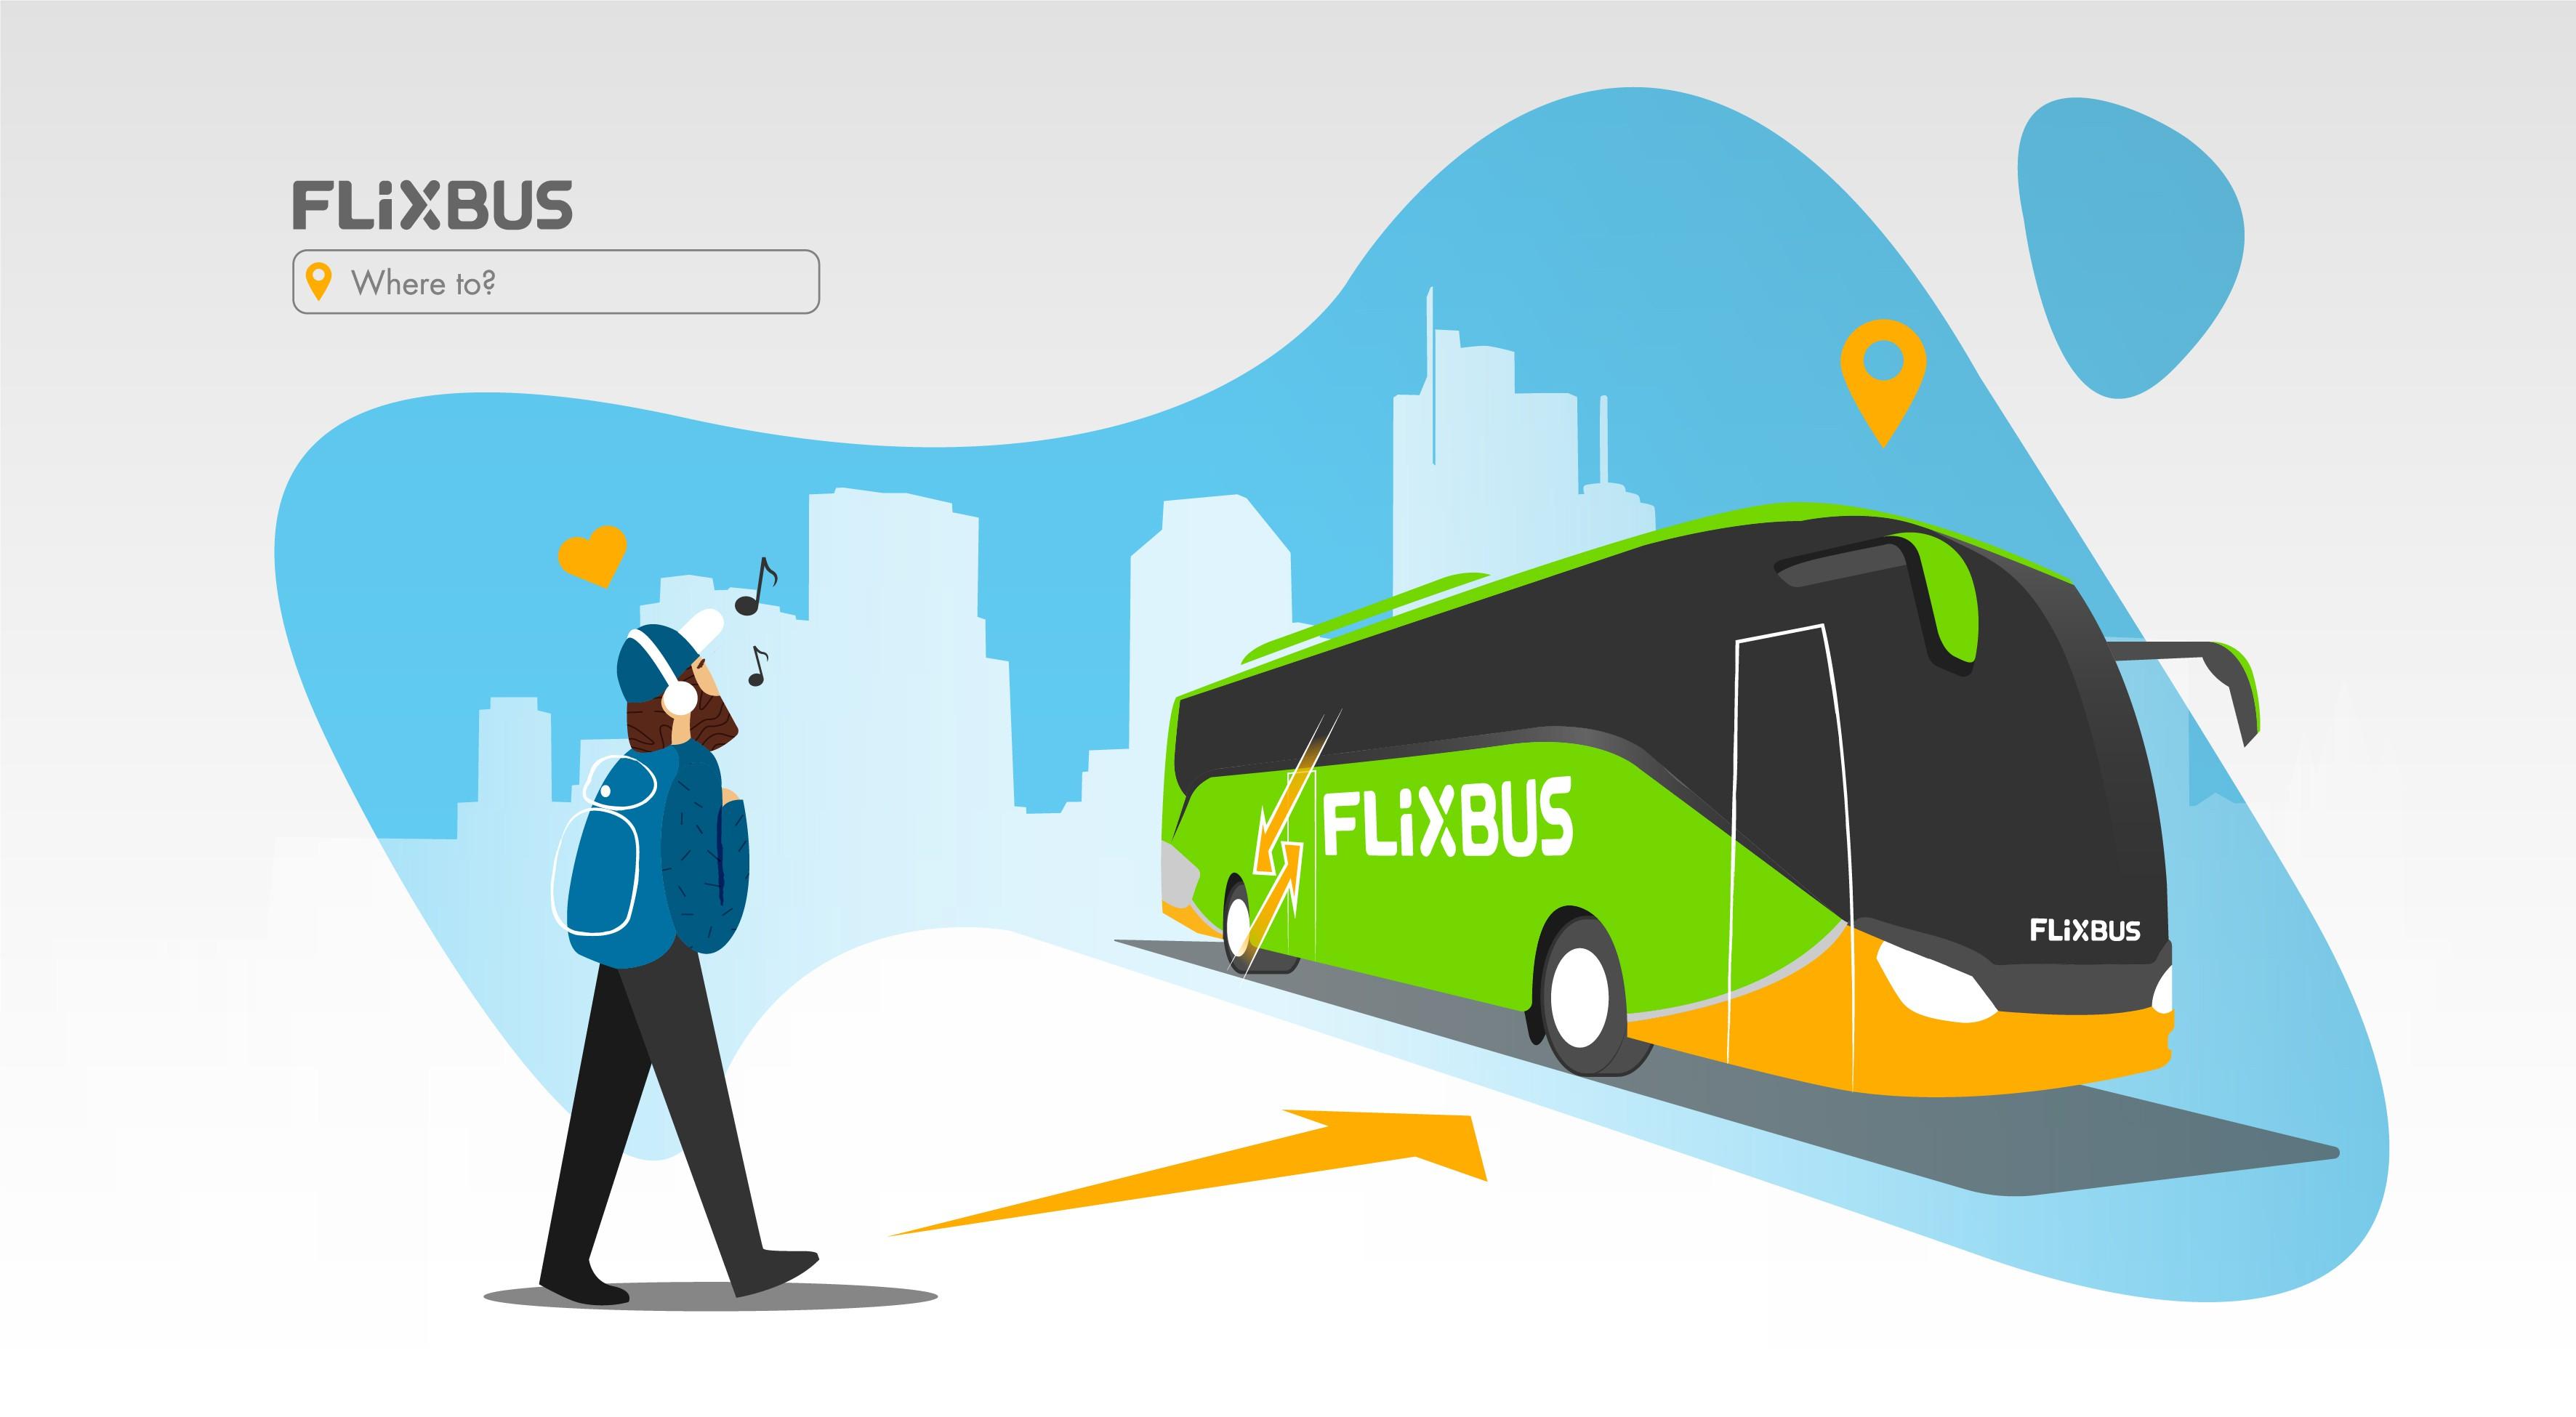 New Illustration Style for FlixBus